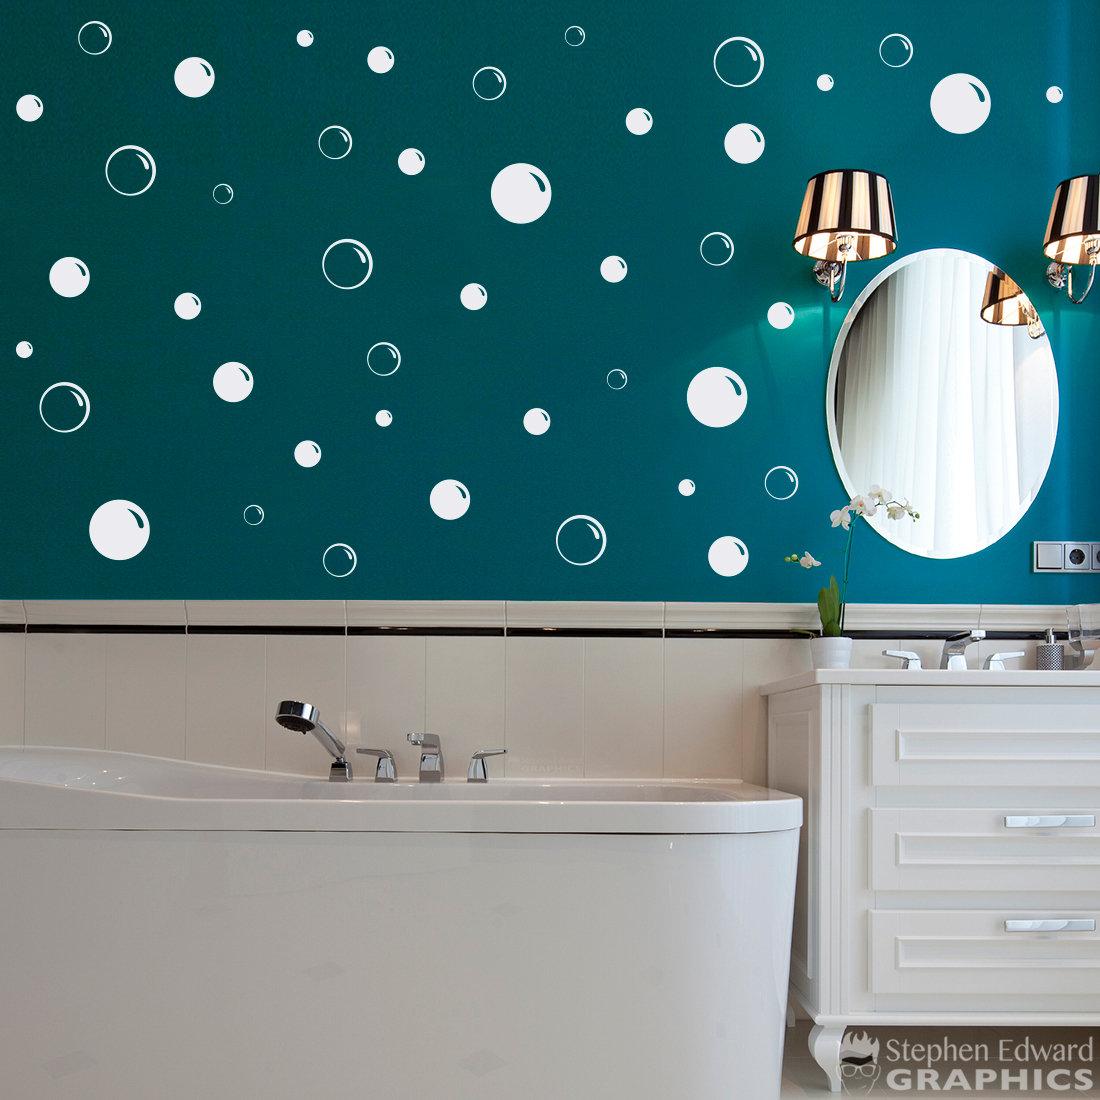 Details about  /wall art bathroom shower tile removable decor decal mural kid sticker bubble、 JC